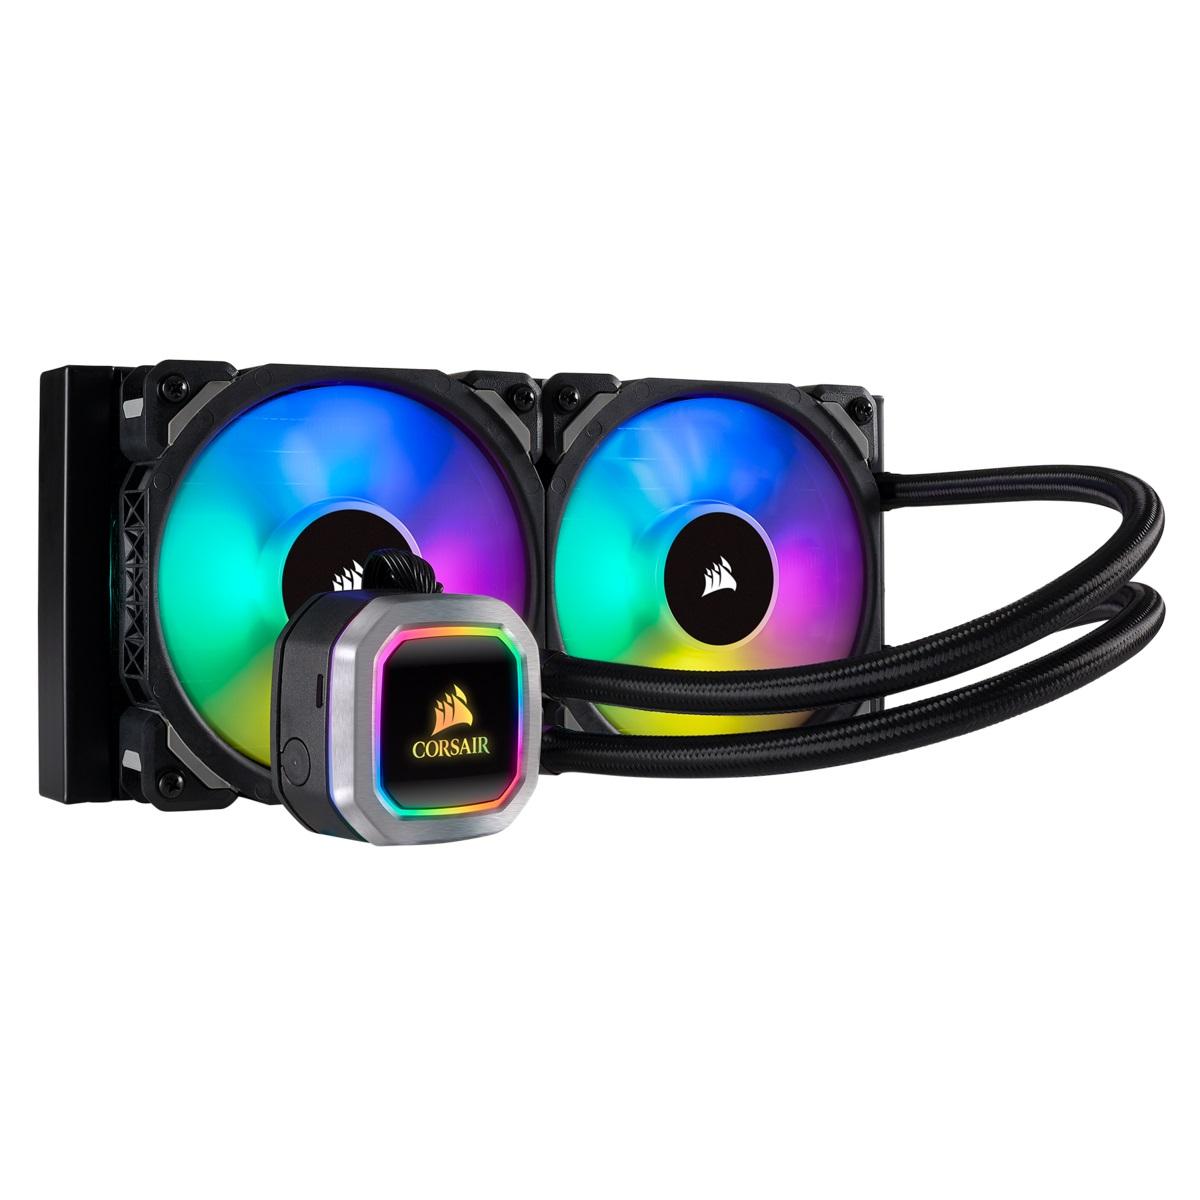 LIQUIDE CPU COOLER CORSAIR H100I PLATINUM FOR AMD & INTEL HYDRO SERIES RGB 240mm CW-9060039-WW ,Fan Cooler